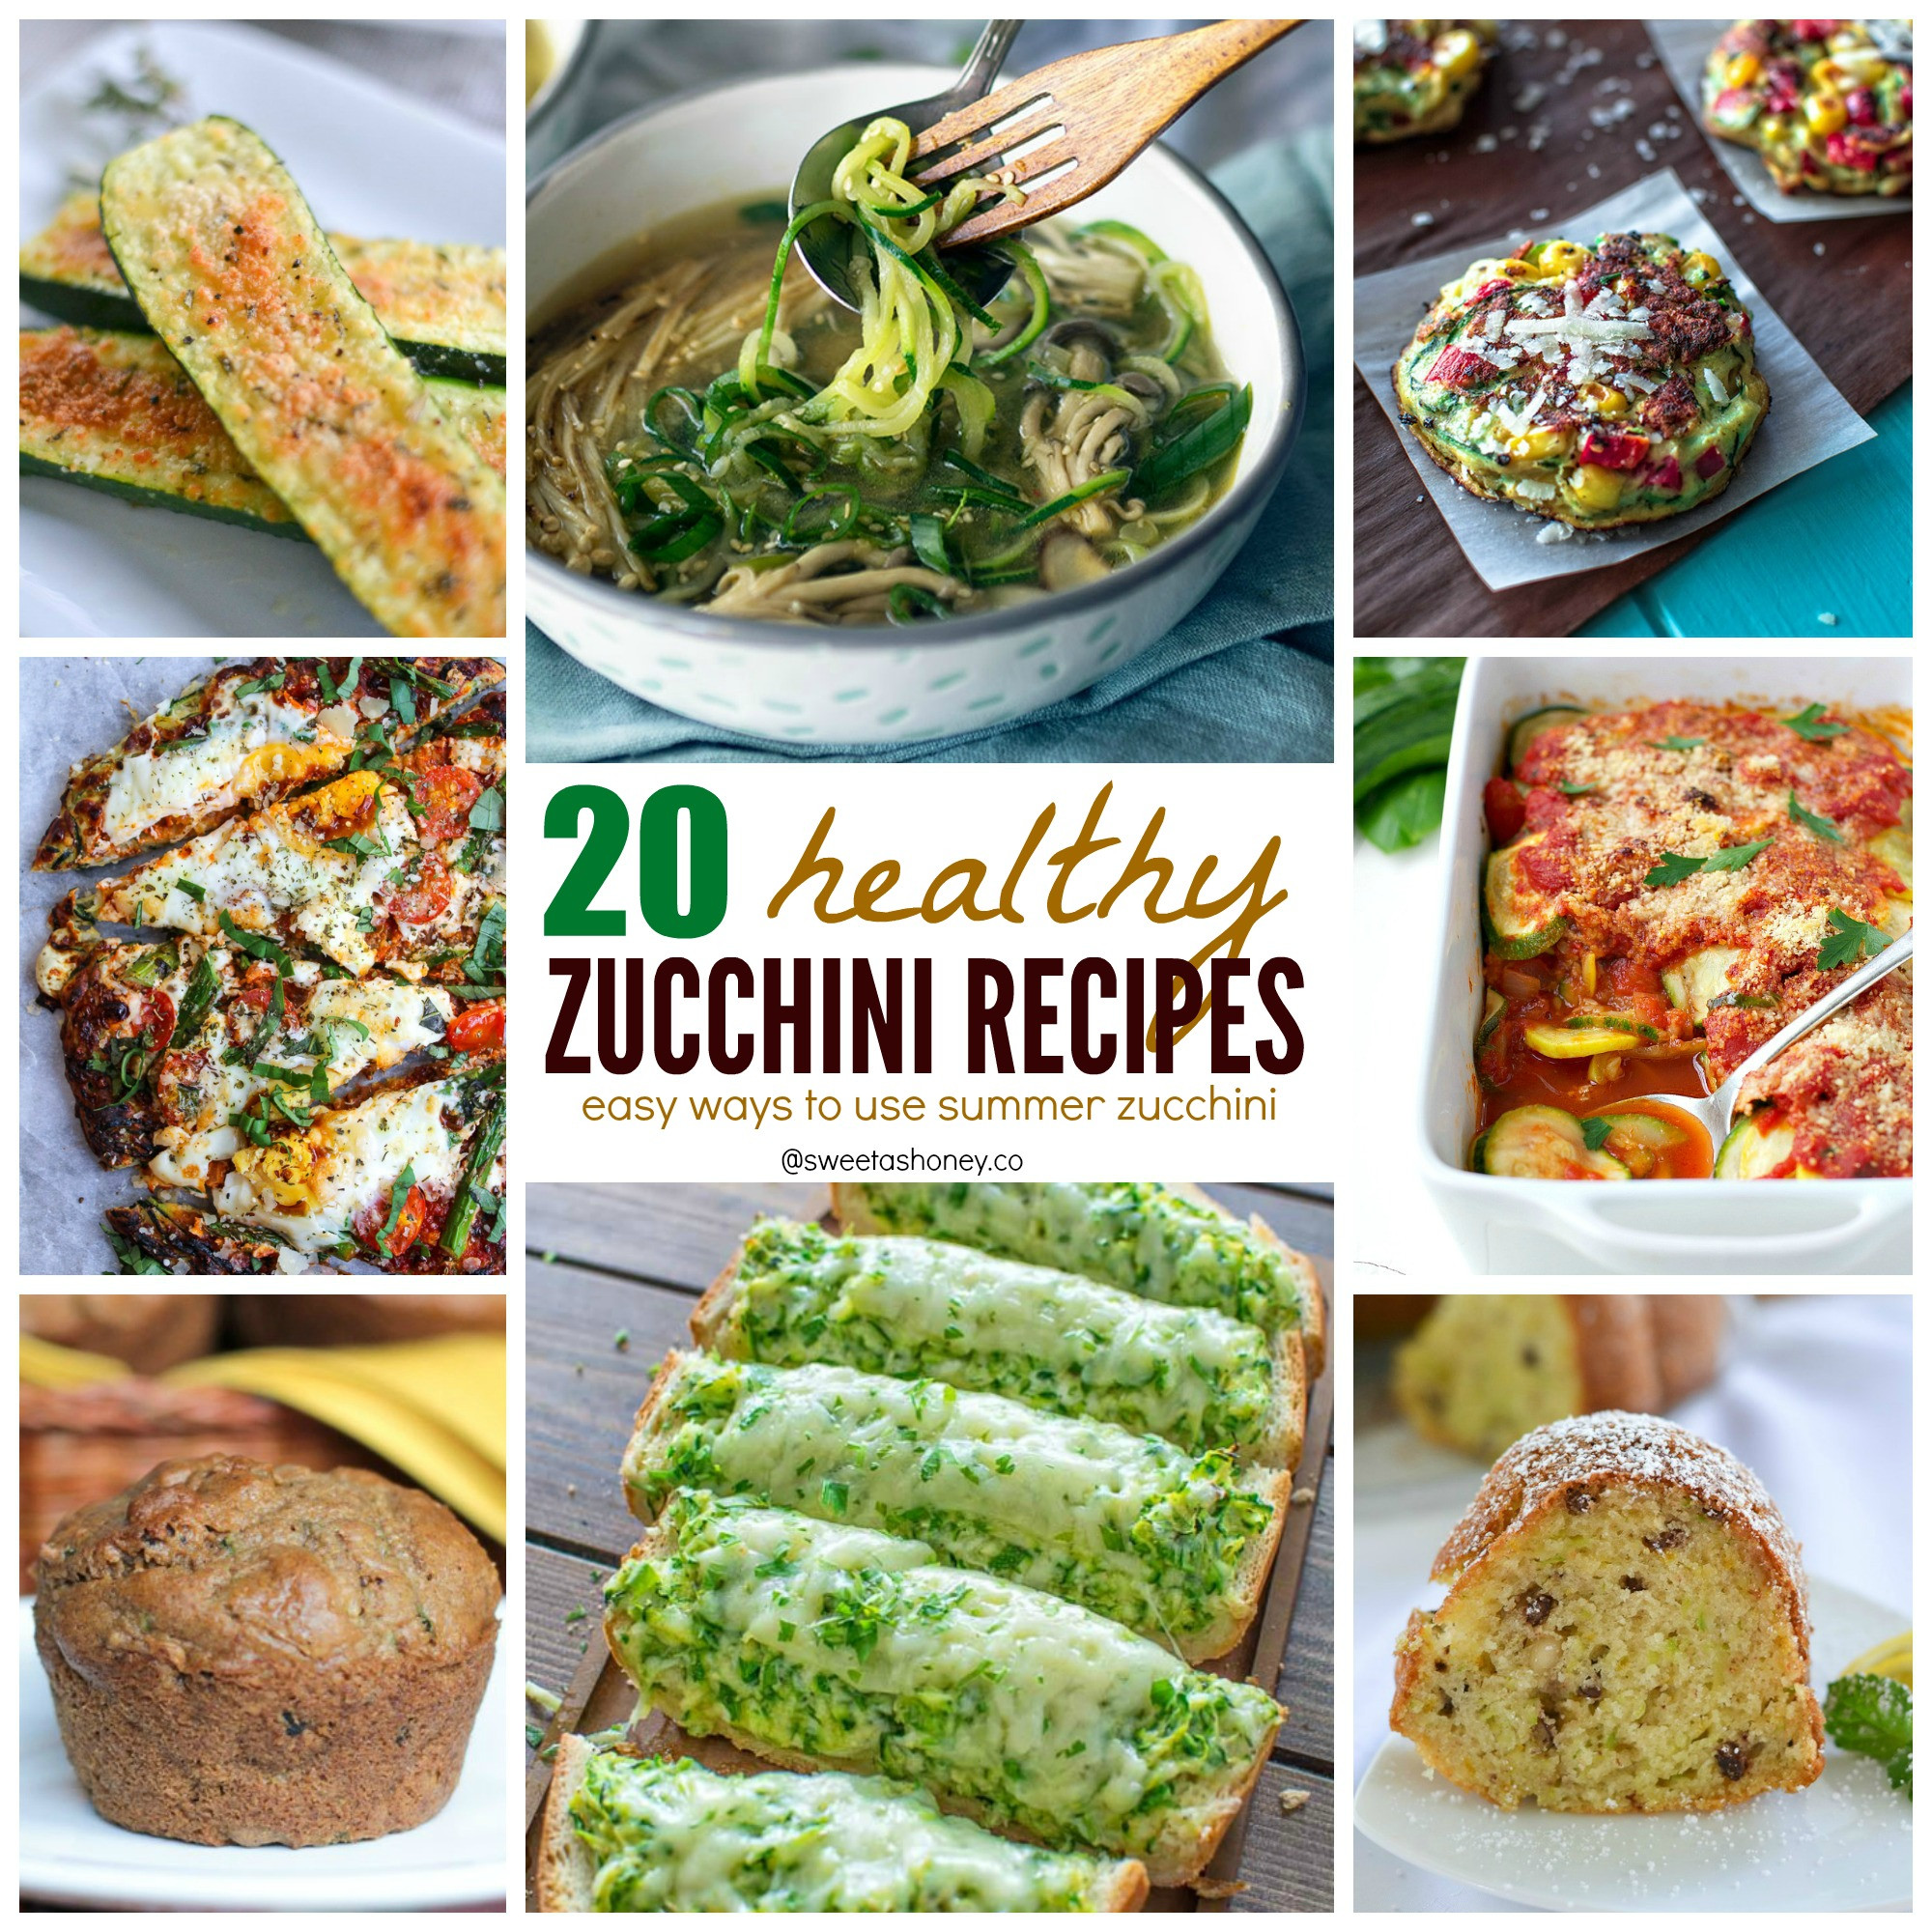 Zucchini Recipe Healthy  Healthy Zucchini Recipes 20 Easy Ways to Use Zucchini